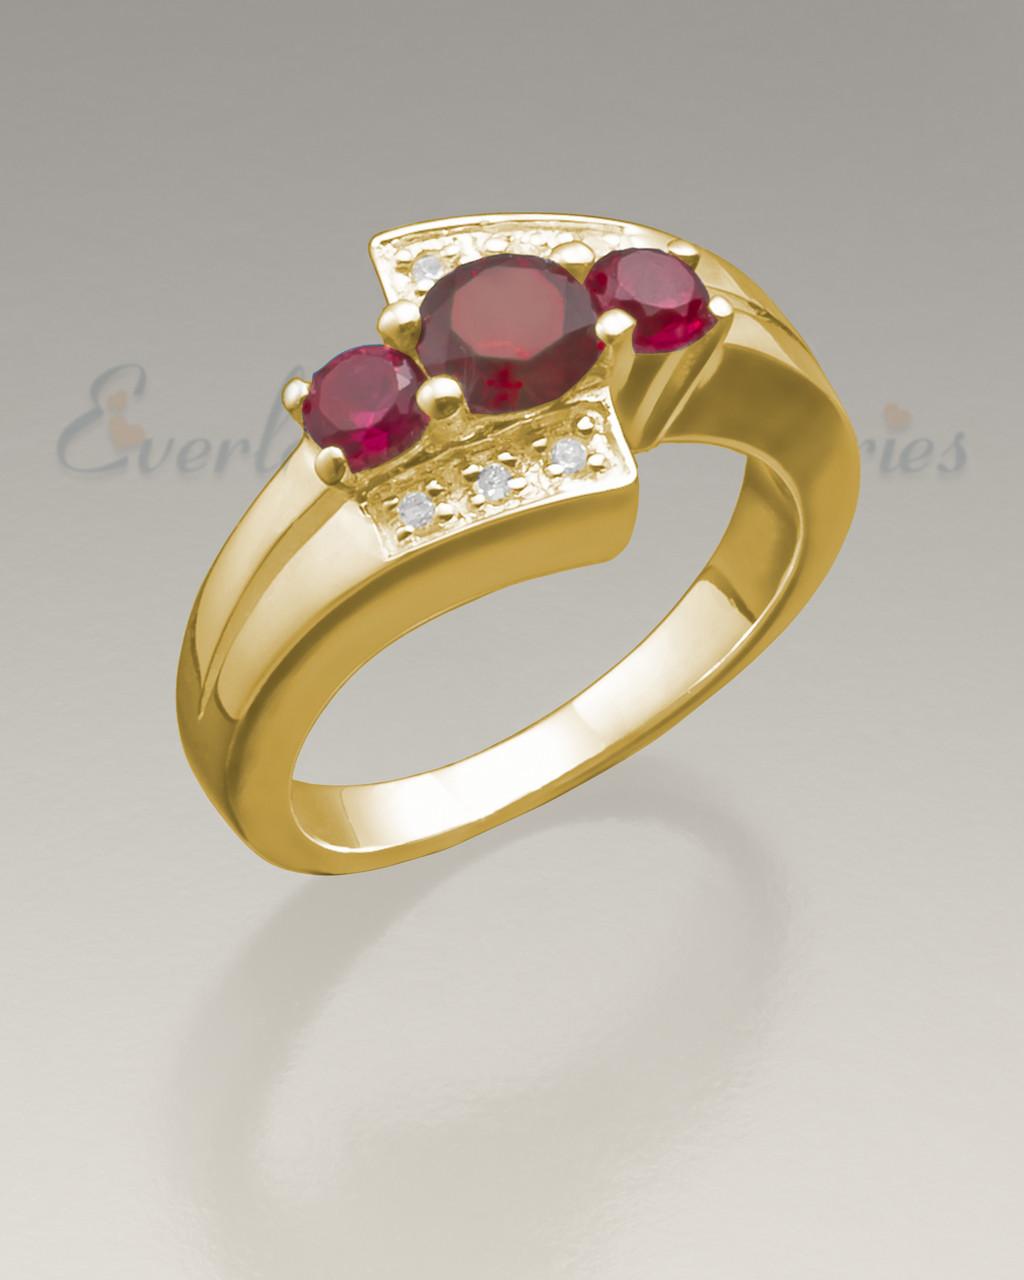 f0b6ef6894e Women's 14K Gold Shimmer Cremation Ring